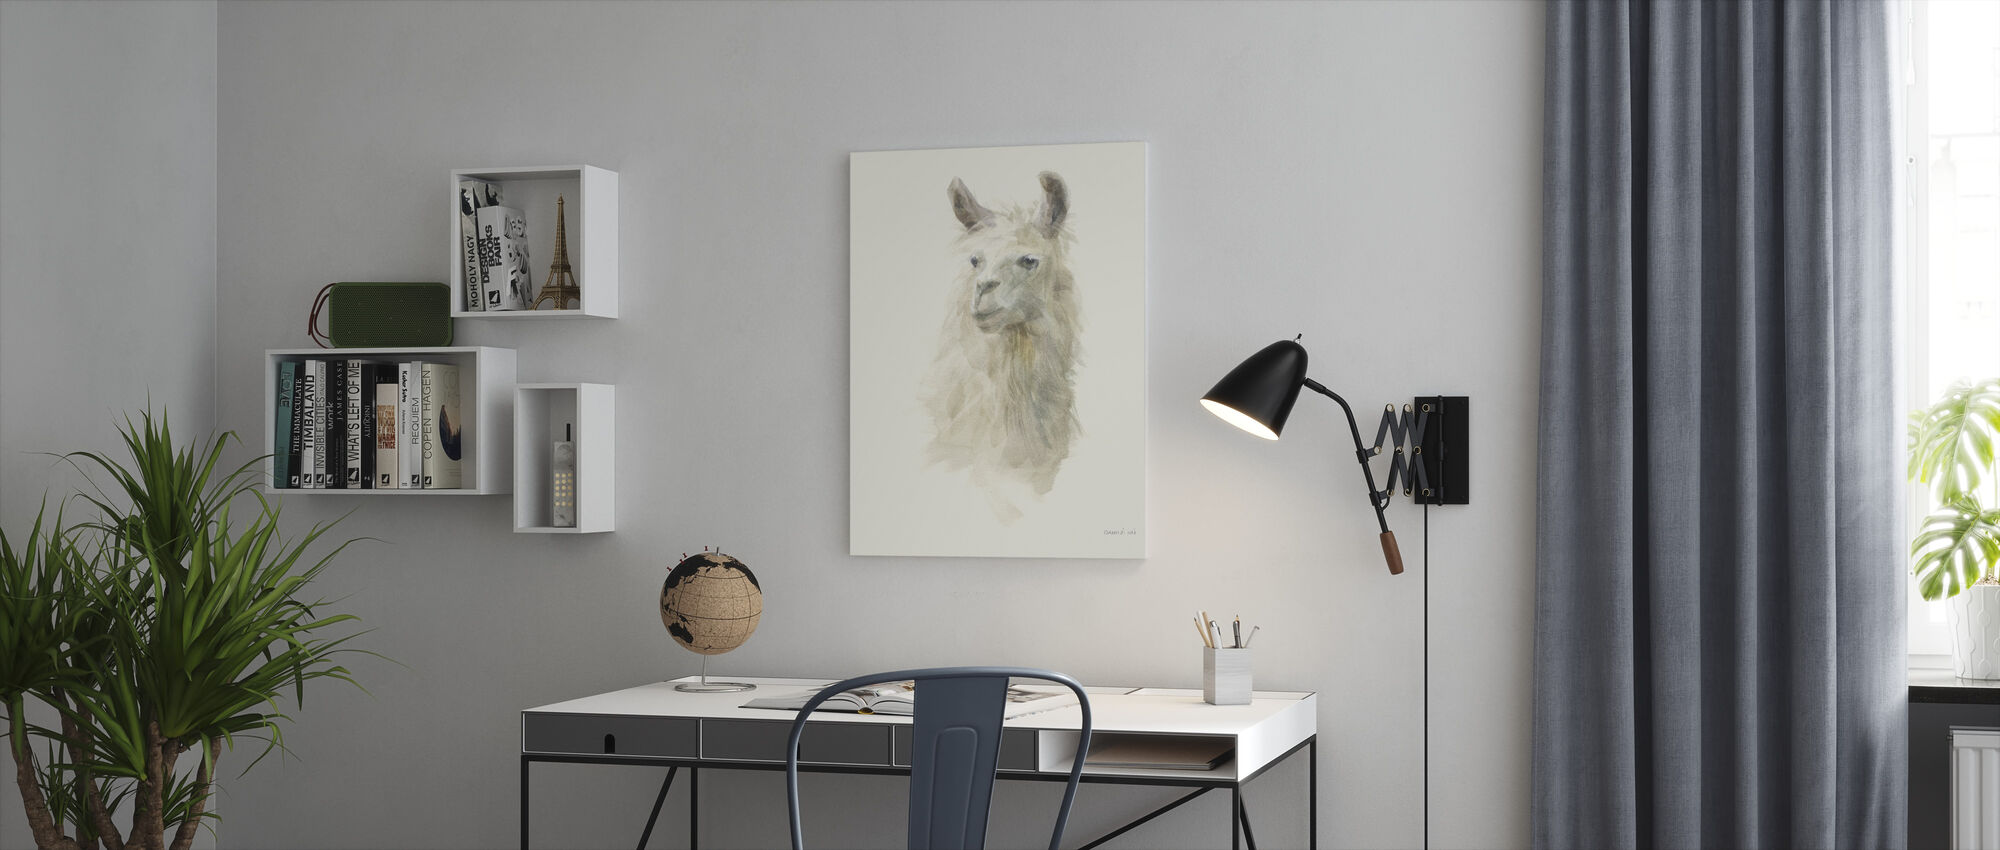 Classic Llamas II - Canvastavla - Kontor